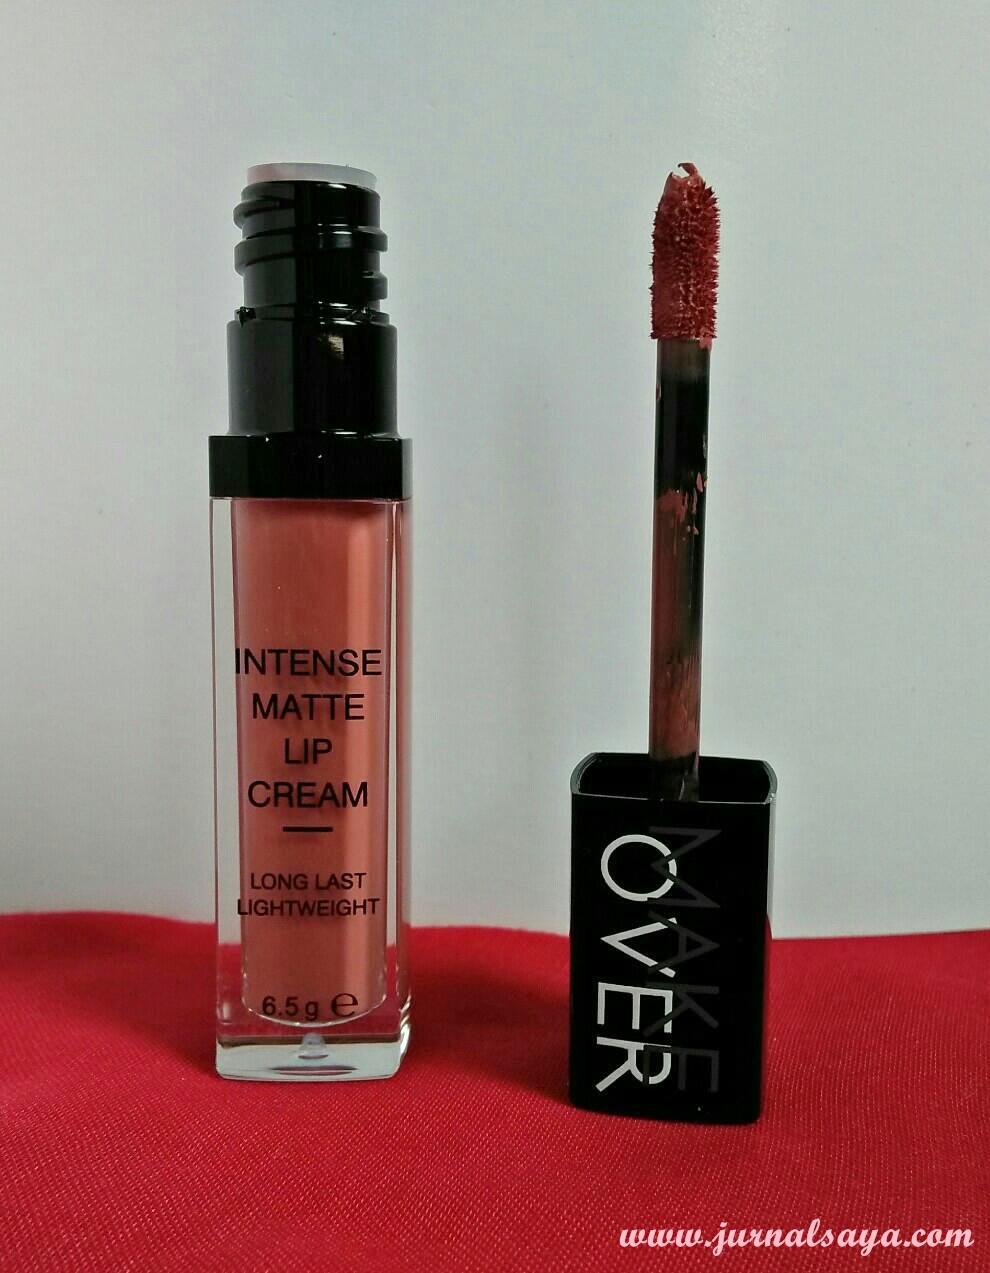 Mencicip 3 Lip Cream Kakak Beradik Jurnalsaya Wardah Intense Matte Lipstik No9 Review Make Over Vanity